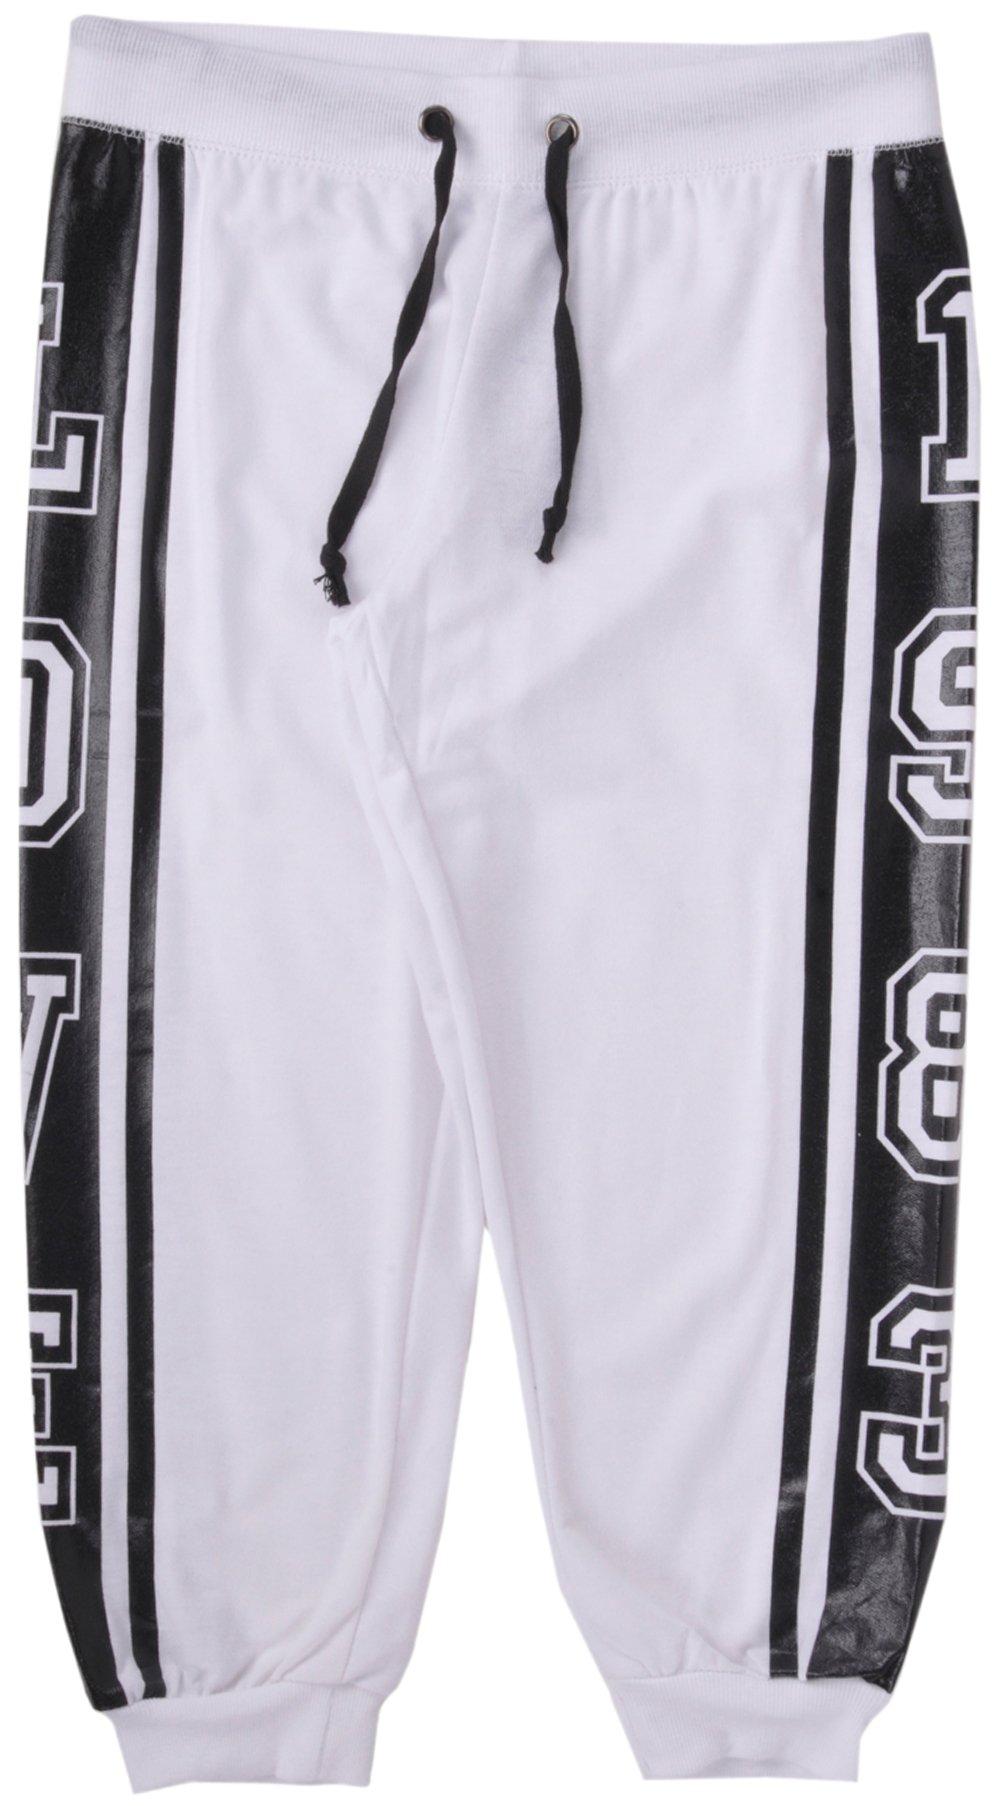 Coco Limon 1983 Love Womens Capri Pants in White